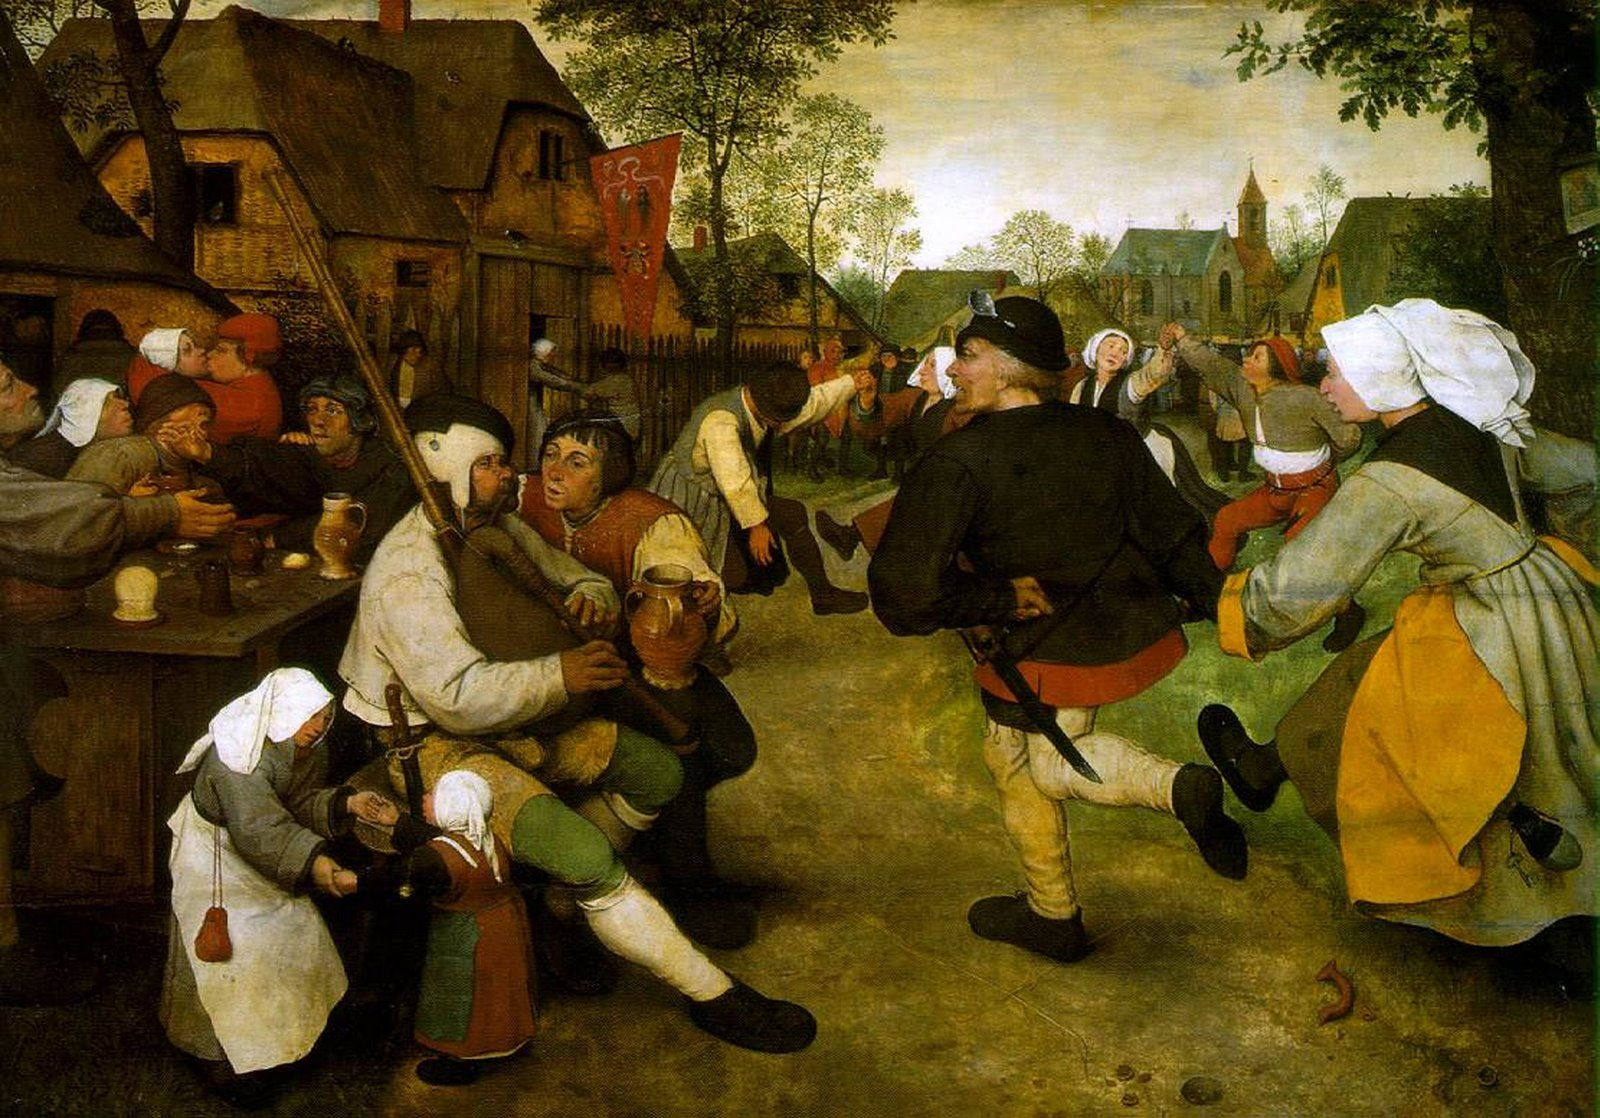 The Peasant Dance.  Pieter Bruegel the Elder.  1567. Oil on oak panel. 114 x 164 cm. Kunsthistorisches Museum. Vienna.